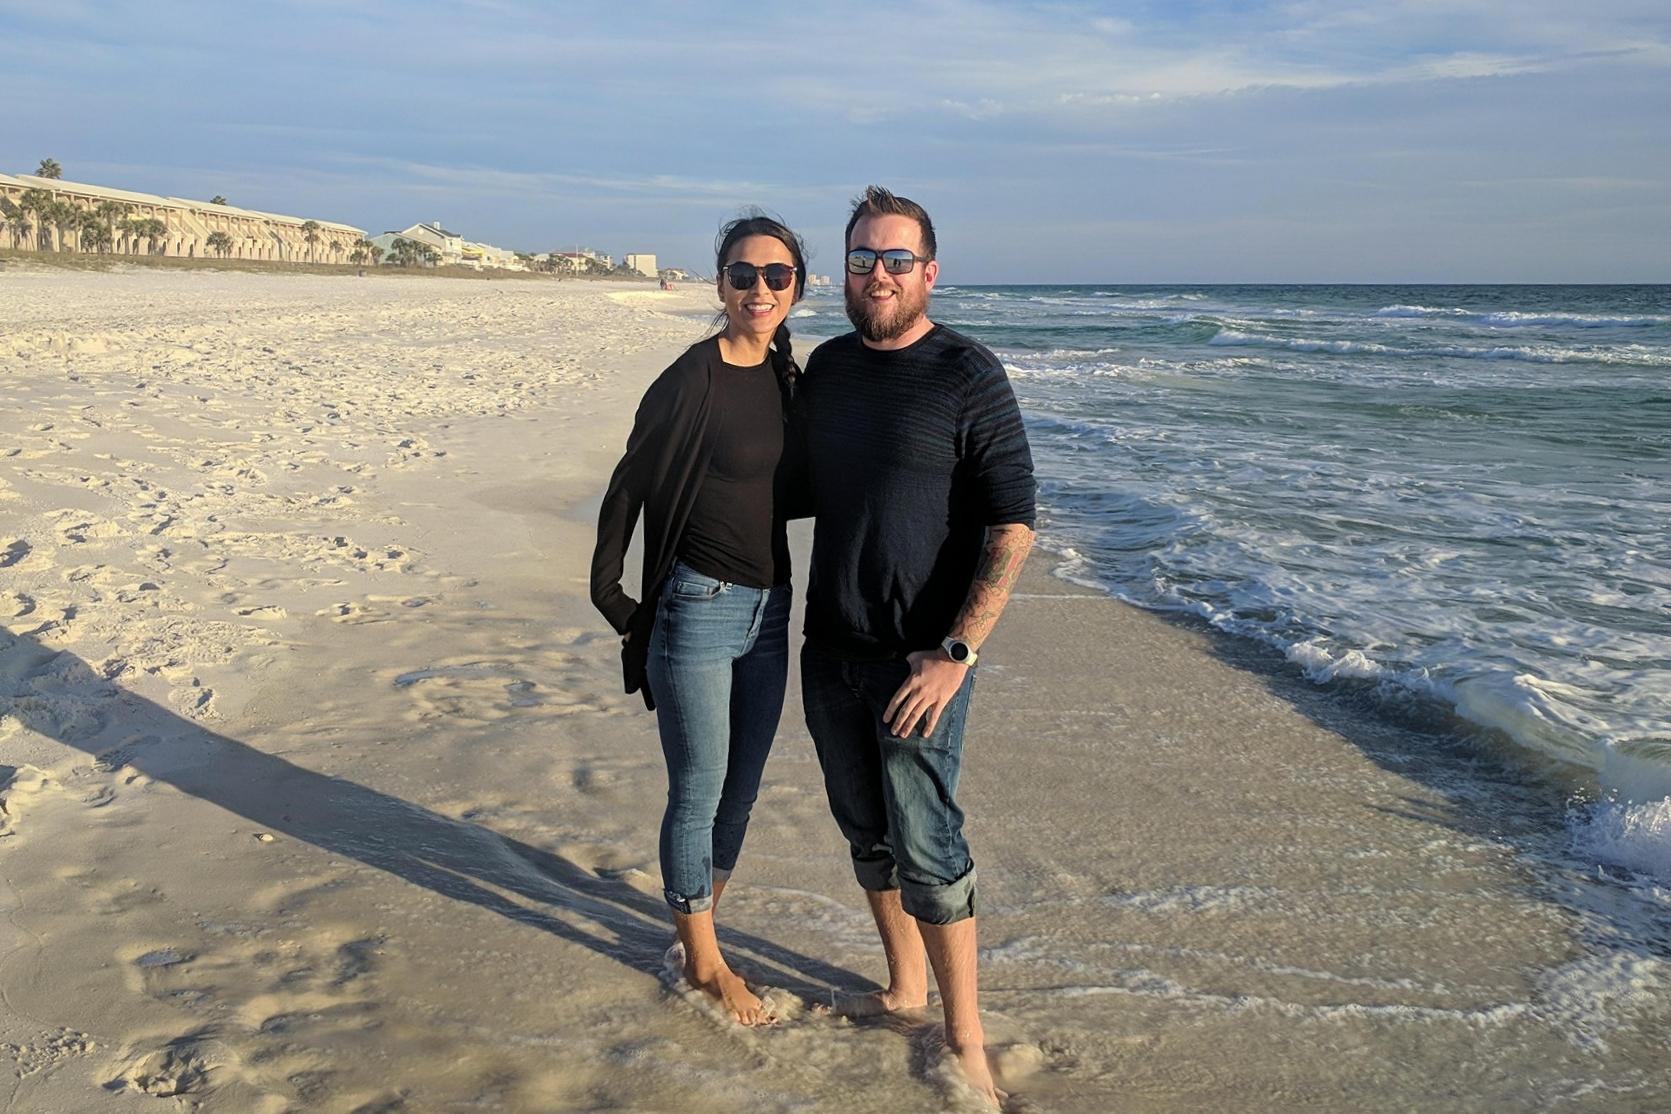 Panama City Beach, FL. Dec 2017